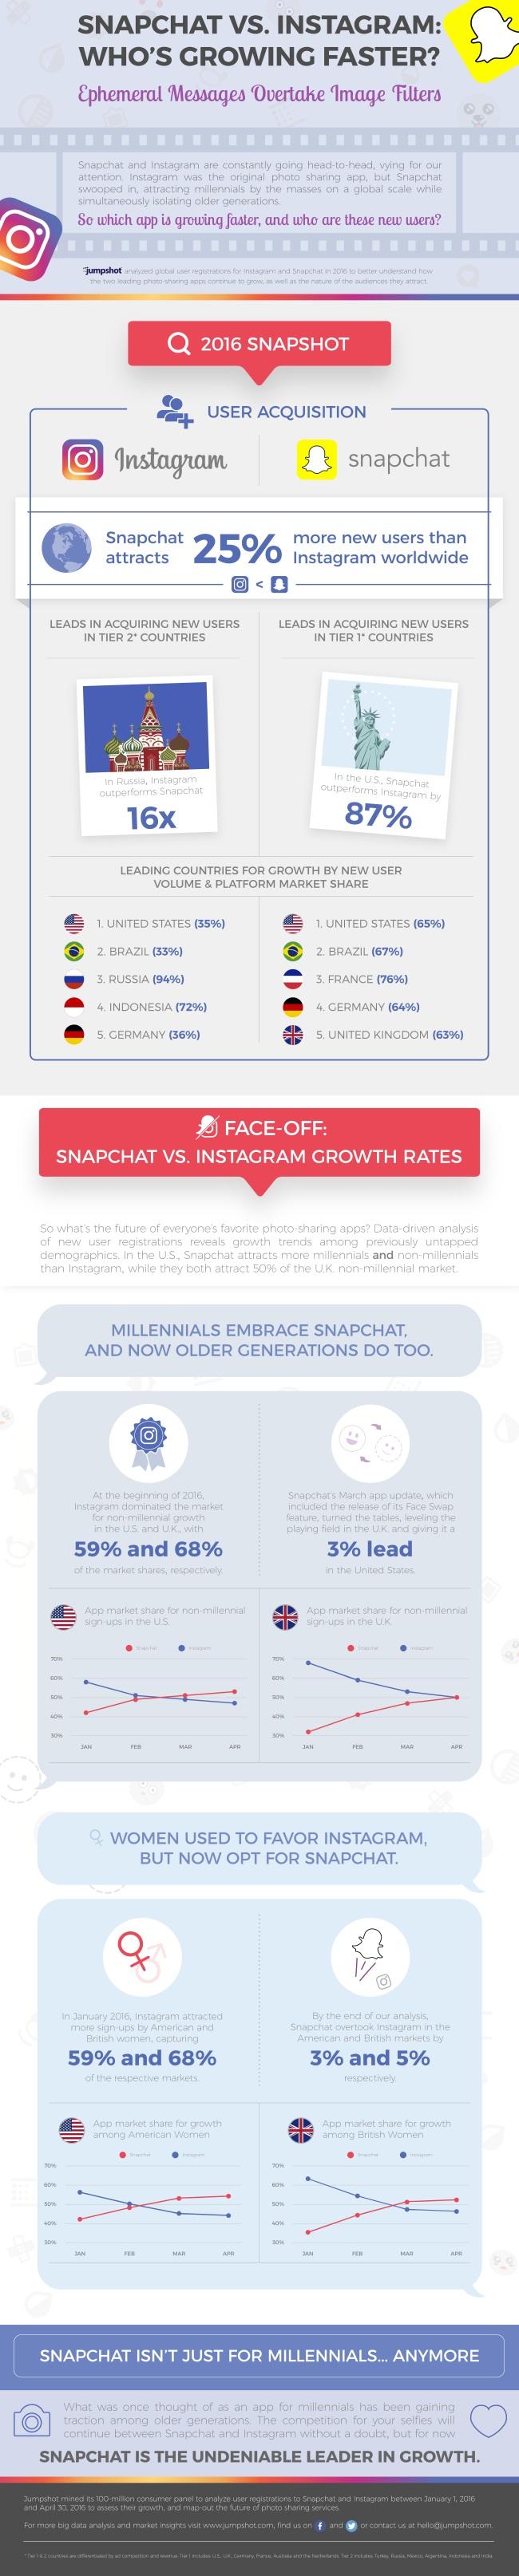 Infographie Snapchat vs Instagram